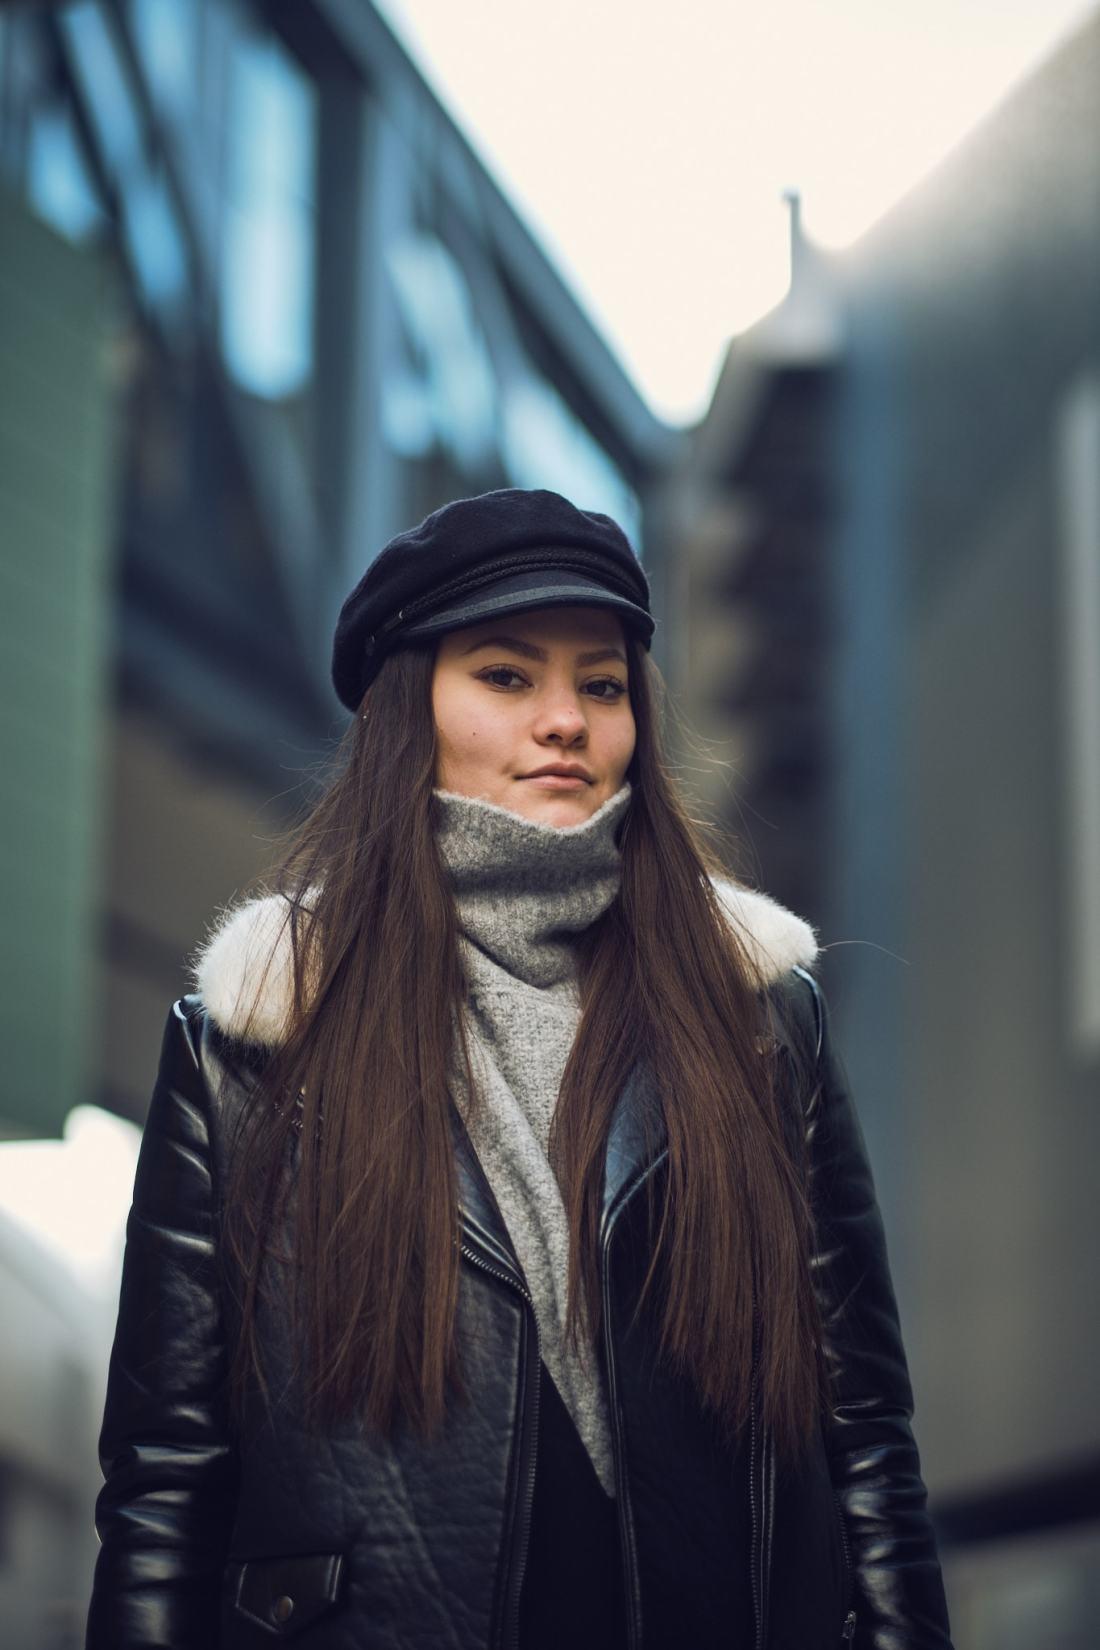 casquette-marin-fashion-blogger-blog-mode-paris-3-min